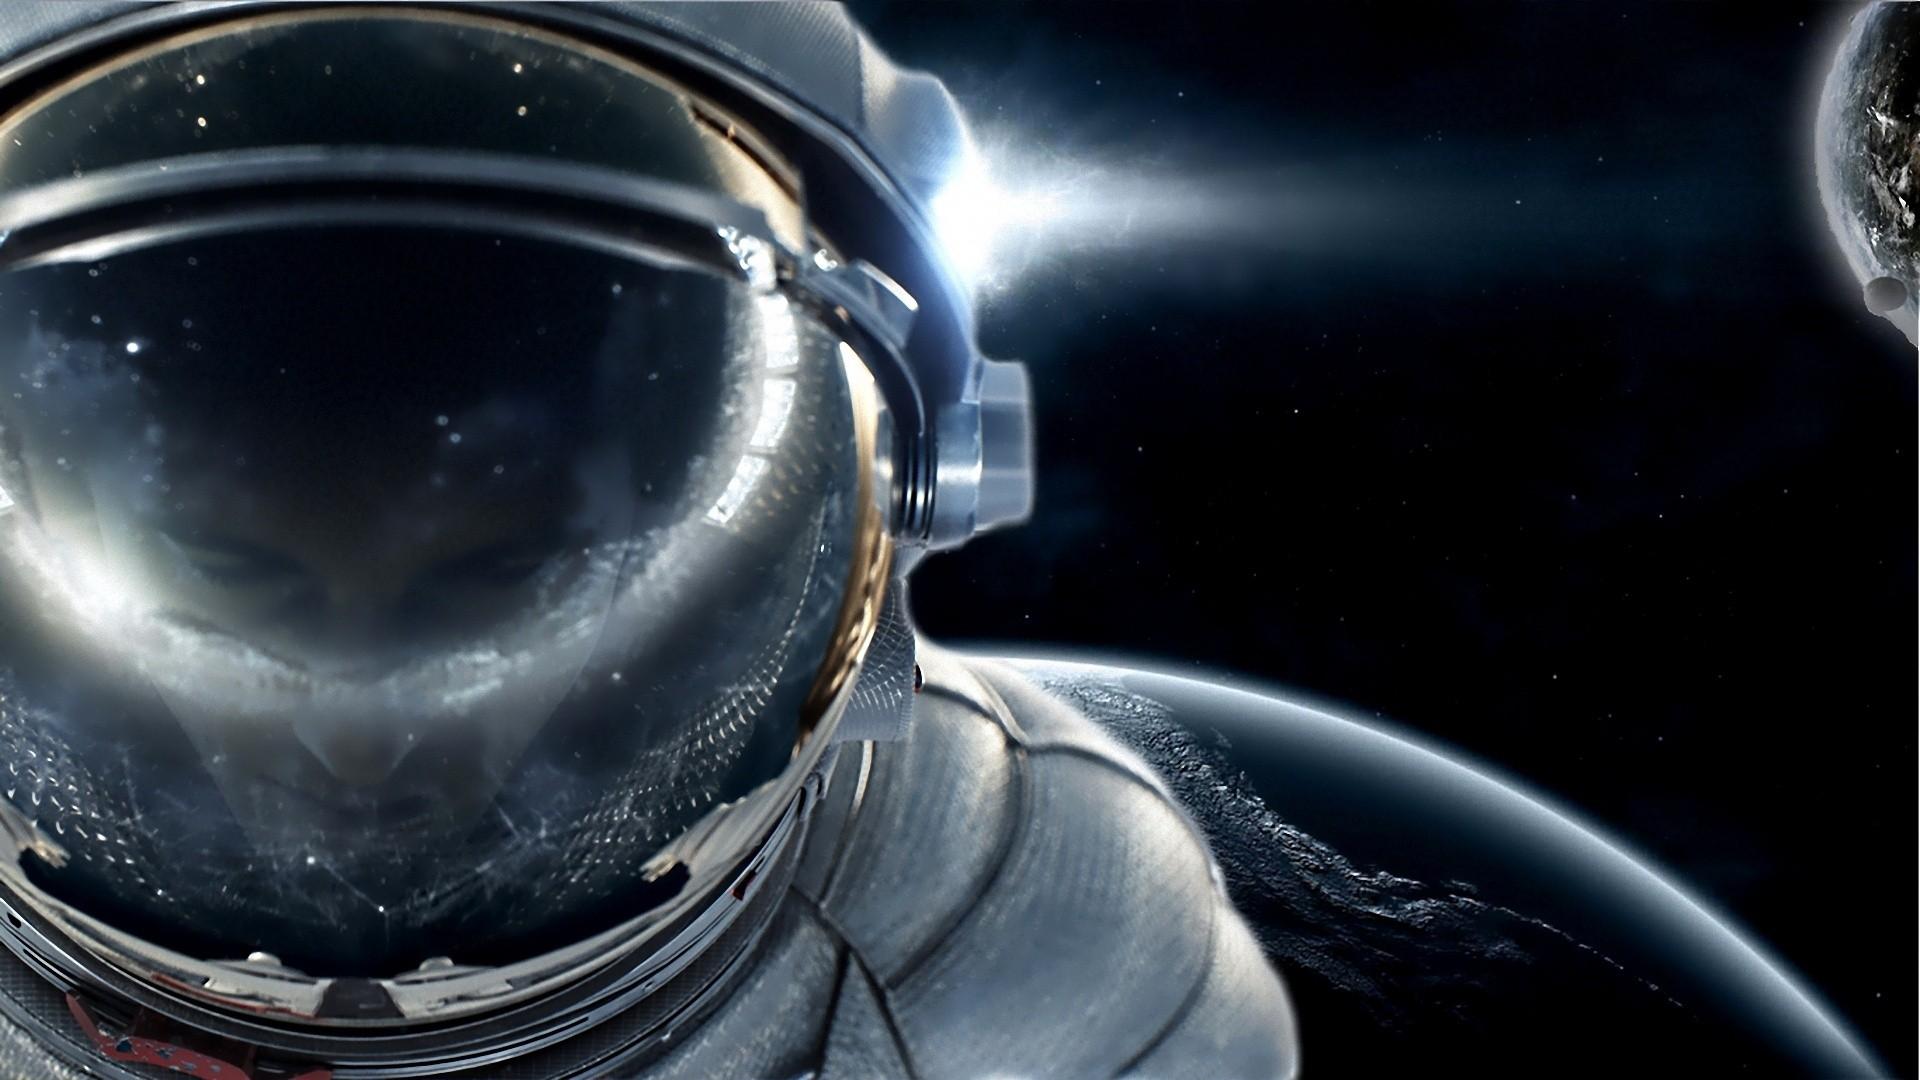 Hd wallpaper astronaut - Astronaut Wallpaper Wallpapersafari